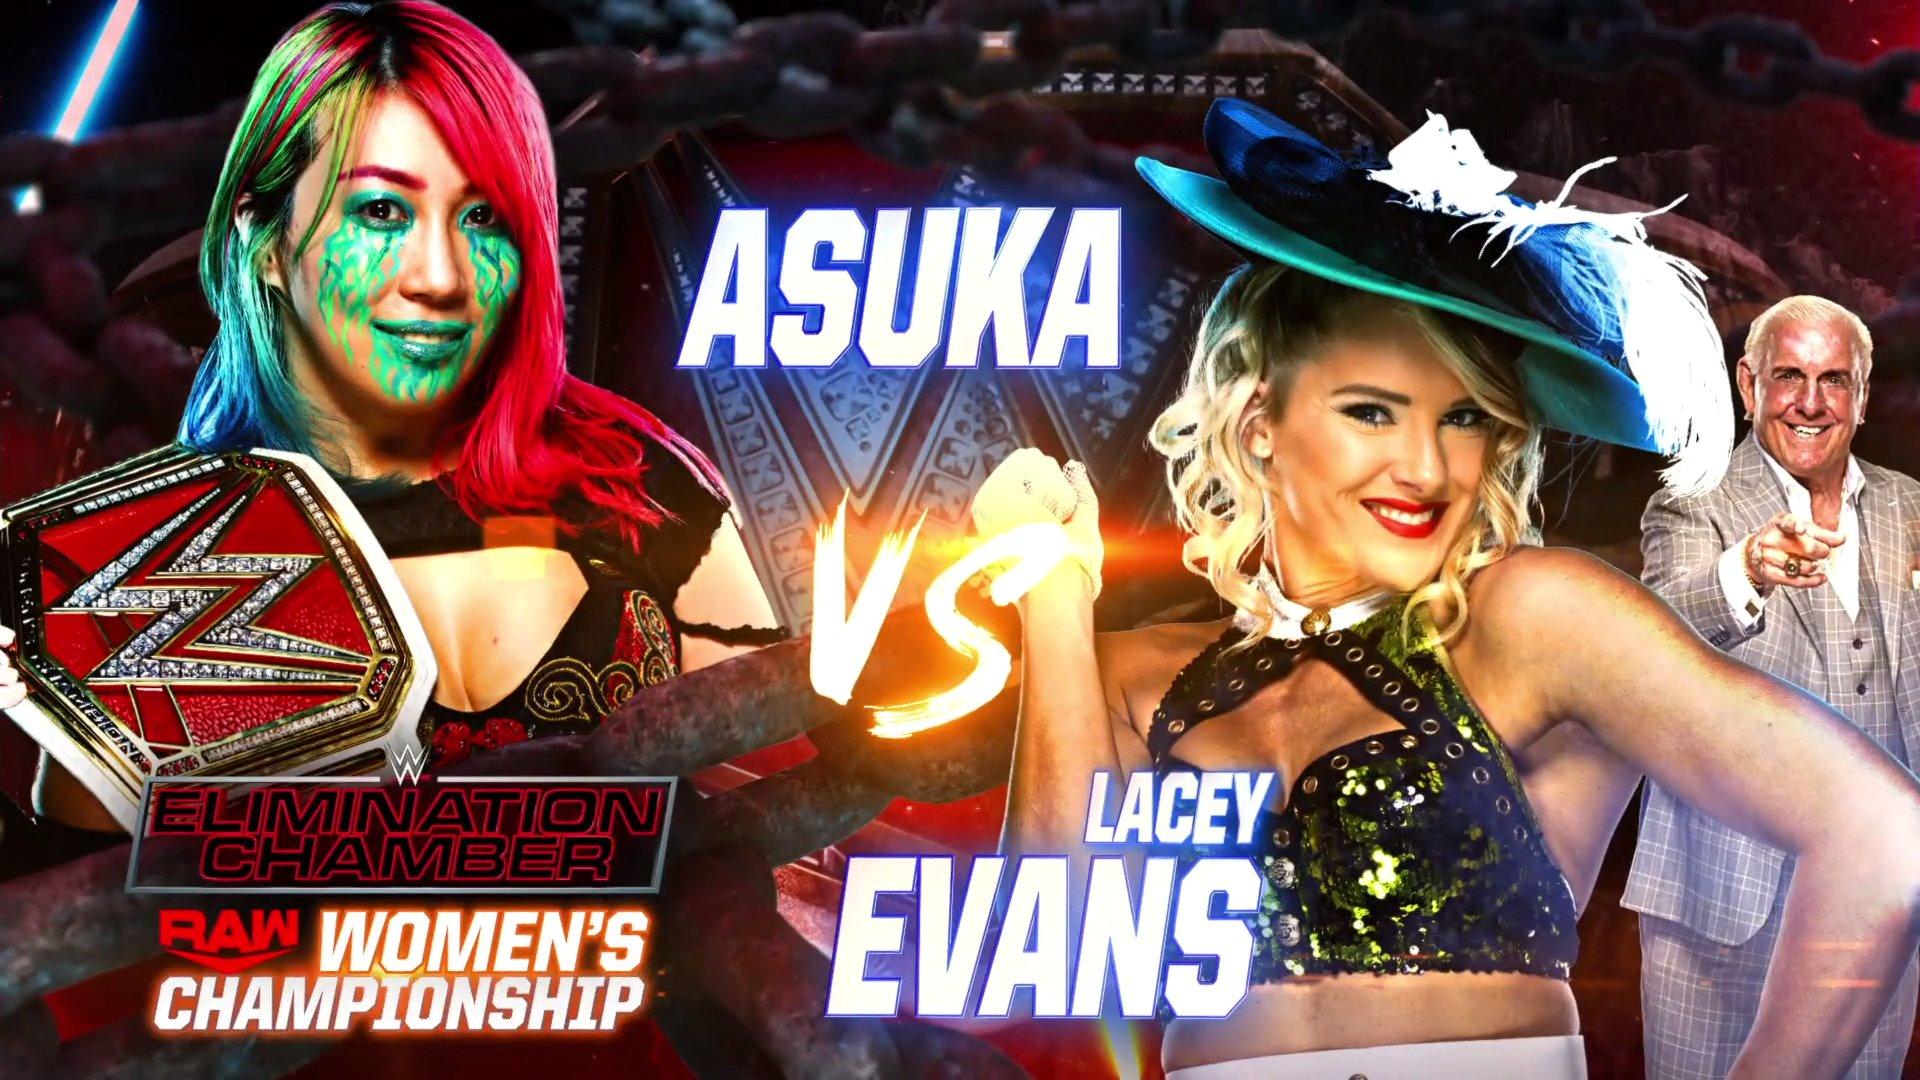 RAW Women's Championship estará em jogo no WWE Elimination Chamber